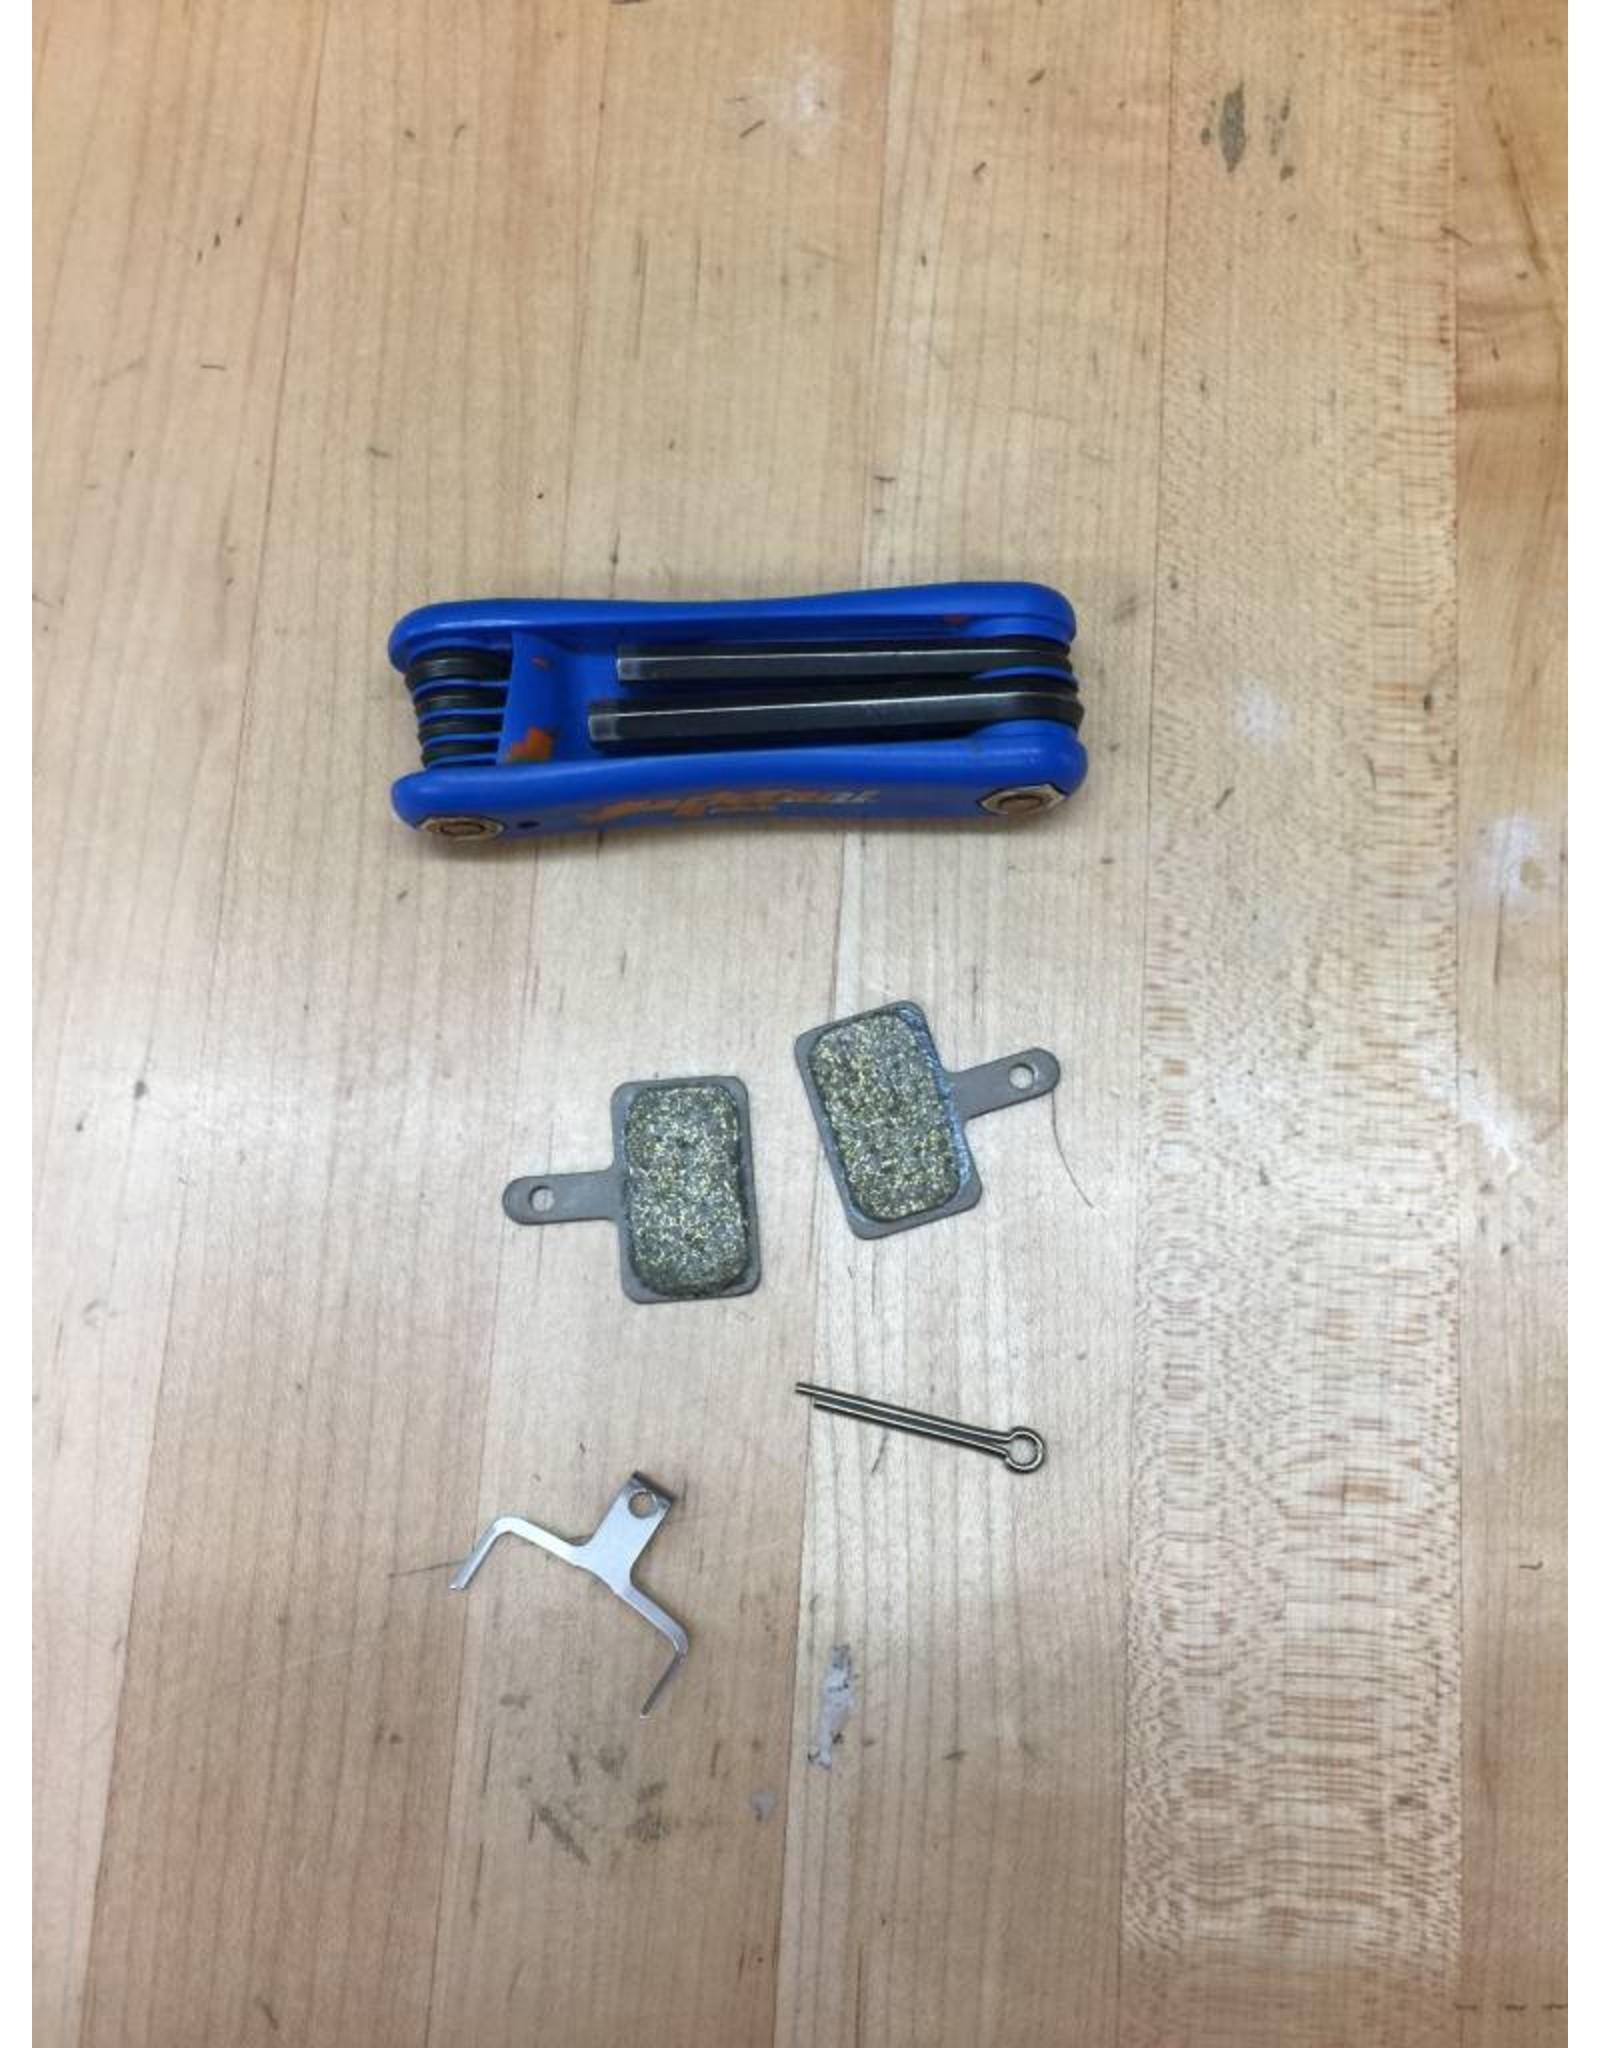 SERVICE Disc Brake Pad Install - Rear ($20-$40)